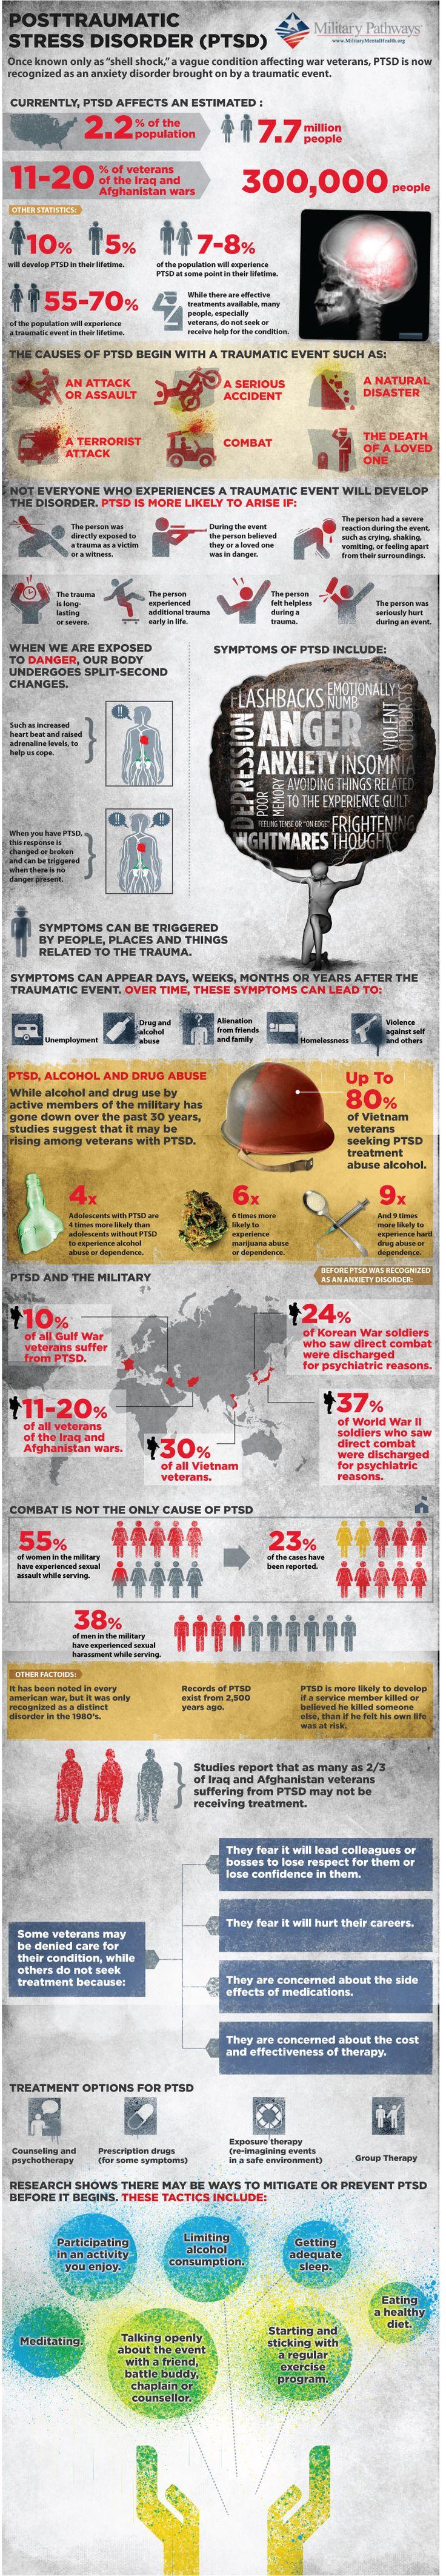 Post traumatic stress disorder of world war